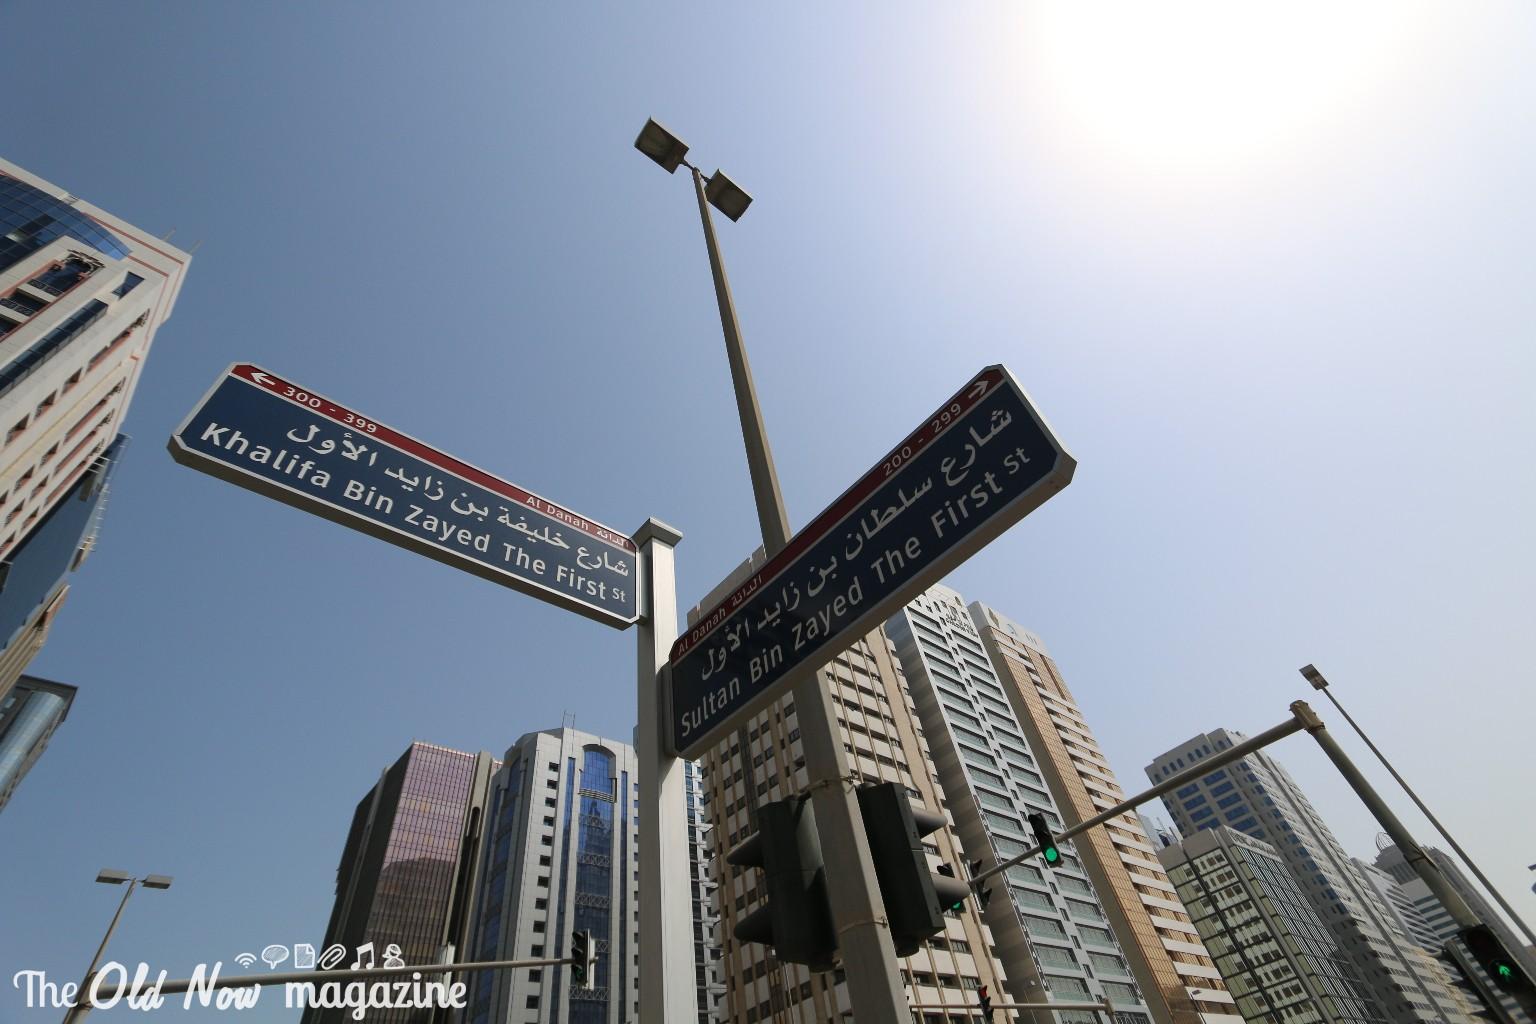 Abu Dhabi THEOLDNOW DAY 1 (7)